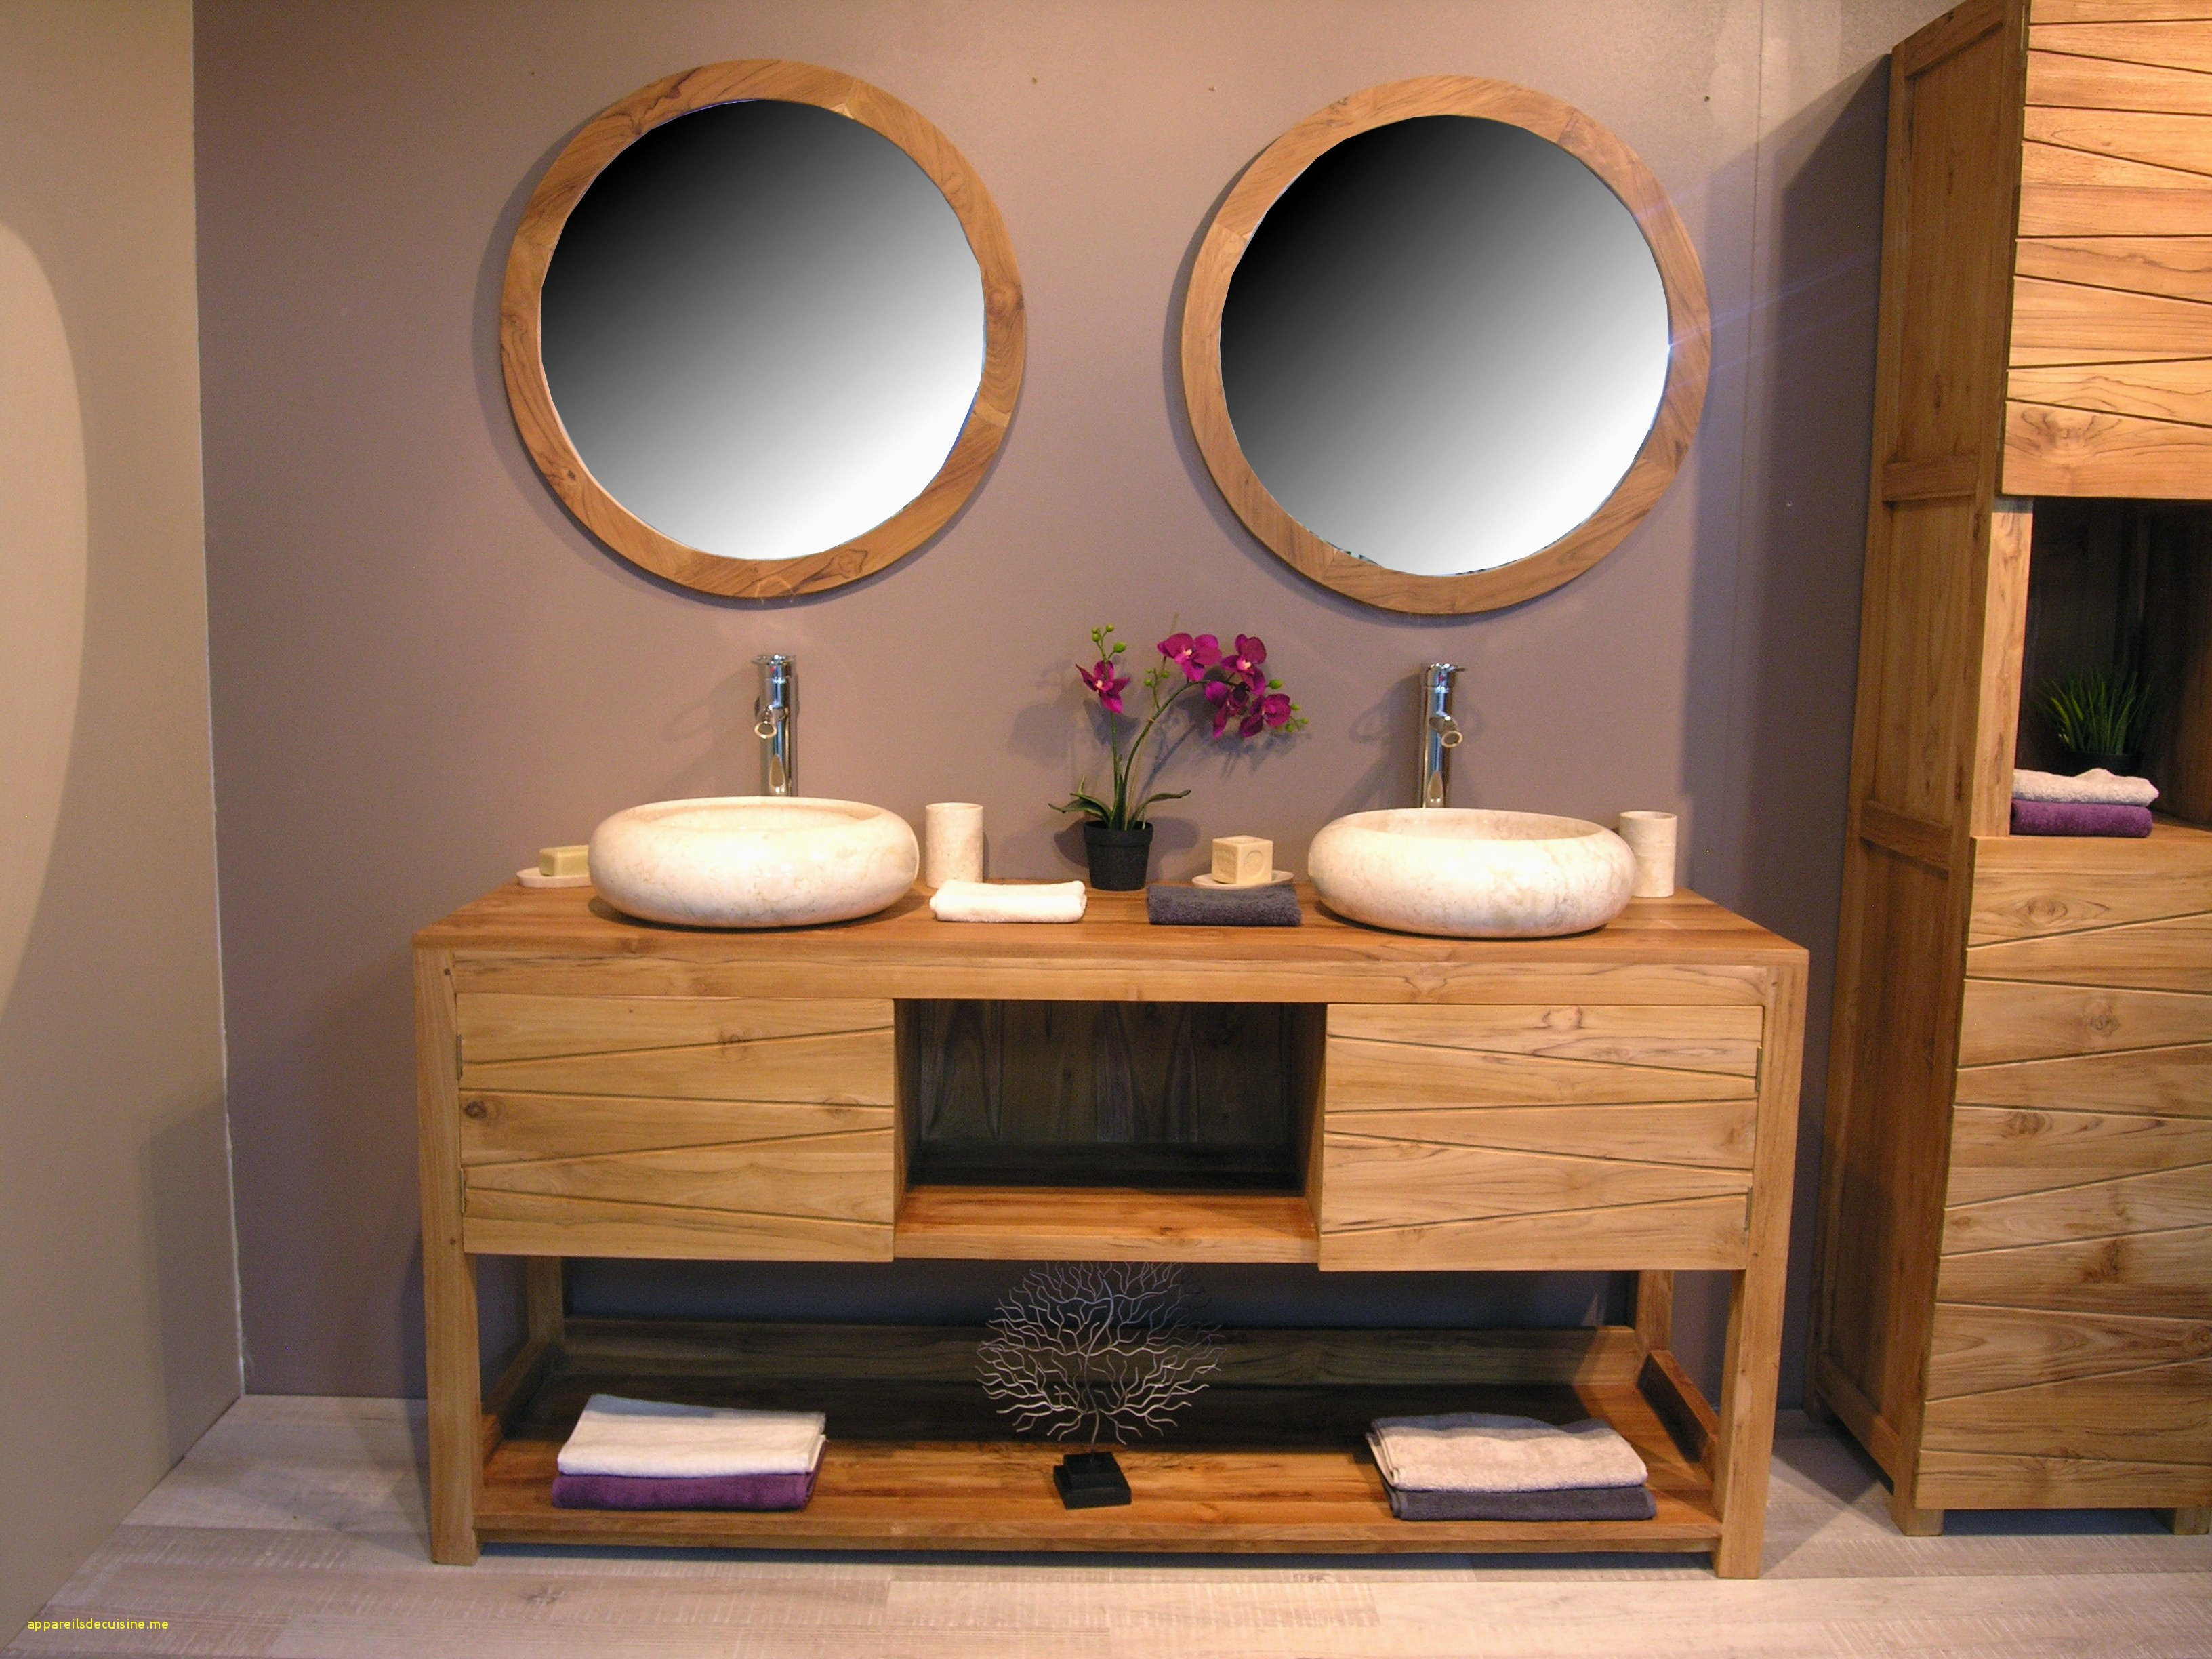 Ikea Salles De Bains Inspirant Images √ Décoration De Maison ☆ Décoration De Maison Contemporaine